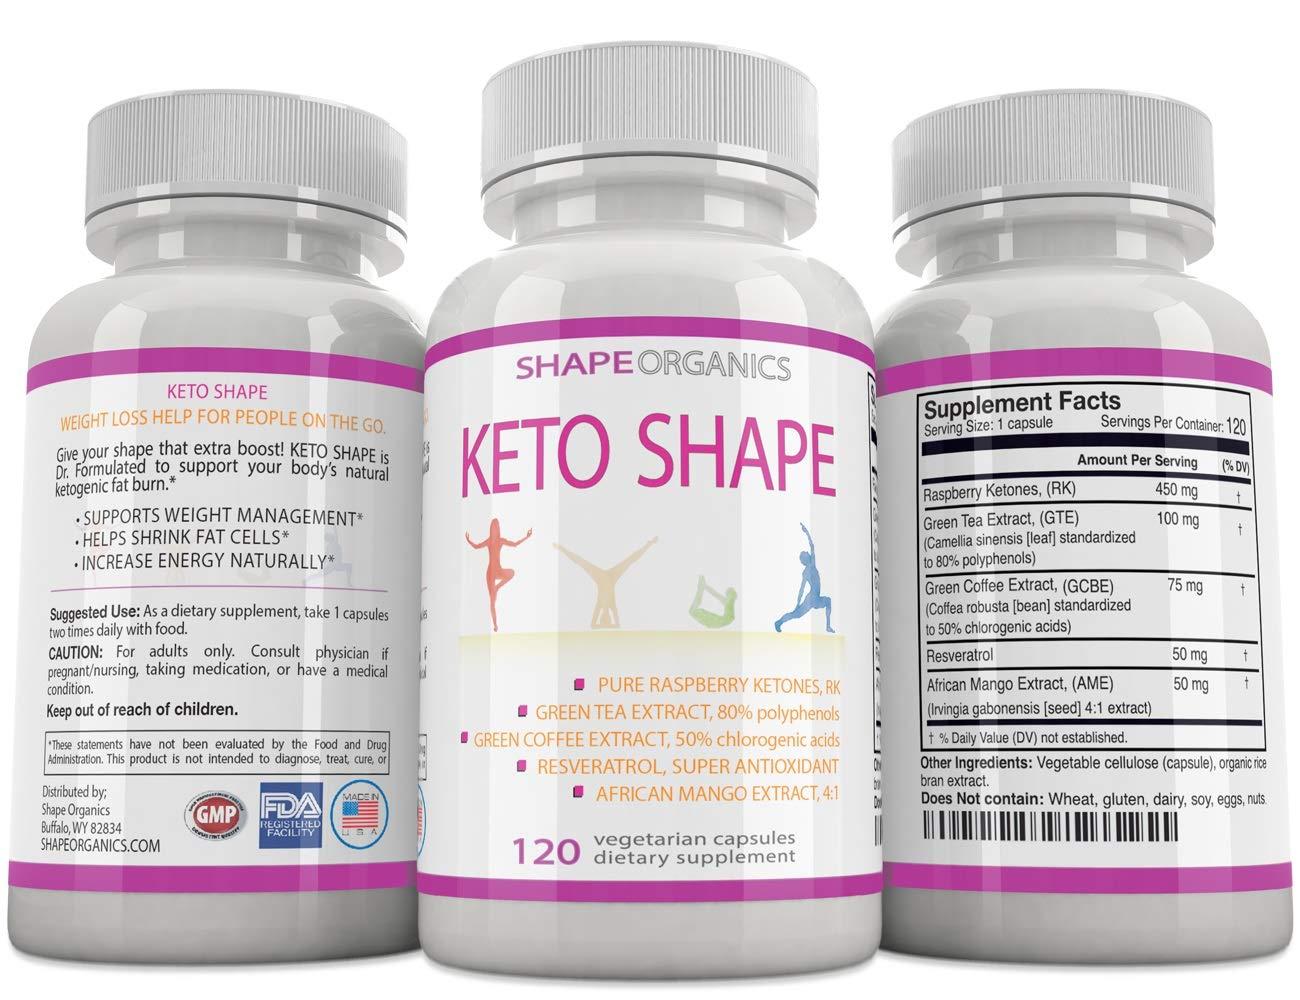 Keto Shape Fat Burn Formula: Max KETOSIS Energy Booster Complex Diet Pill That Works Fast for Women and Men, Green Tea, Coffee Bean Extract, Raspberry Ketone, African Mango, Resveratrol 120 Veg Cap